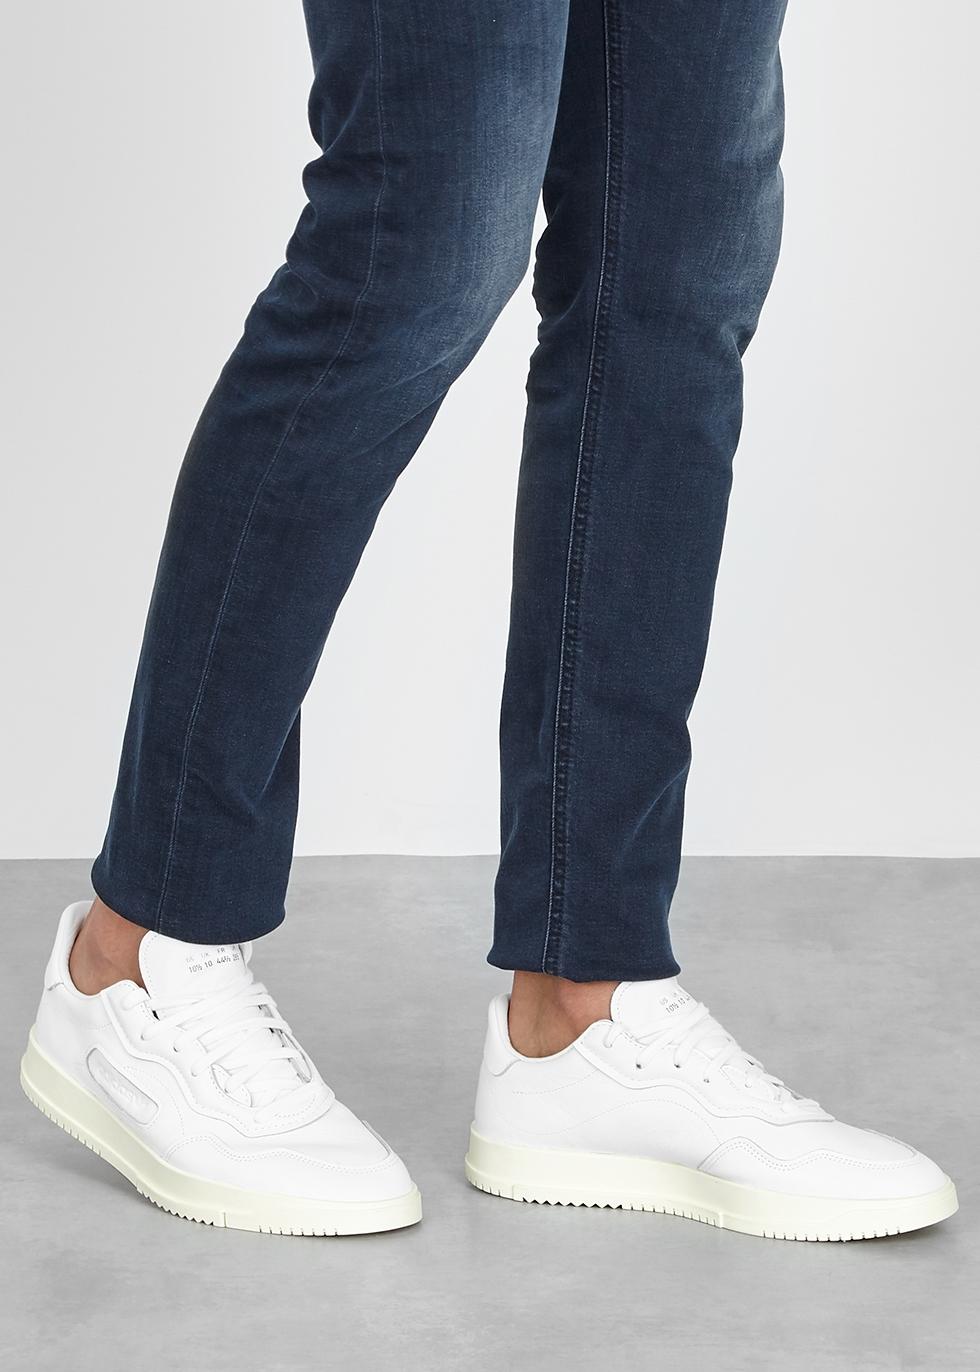 adidas Originals SC Premiere white leather sneakers Harvey